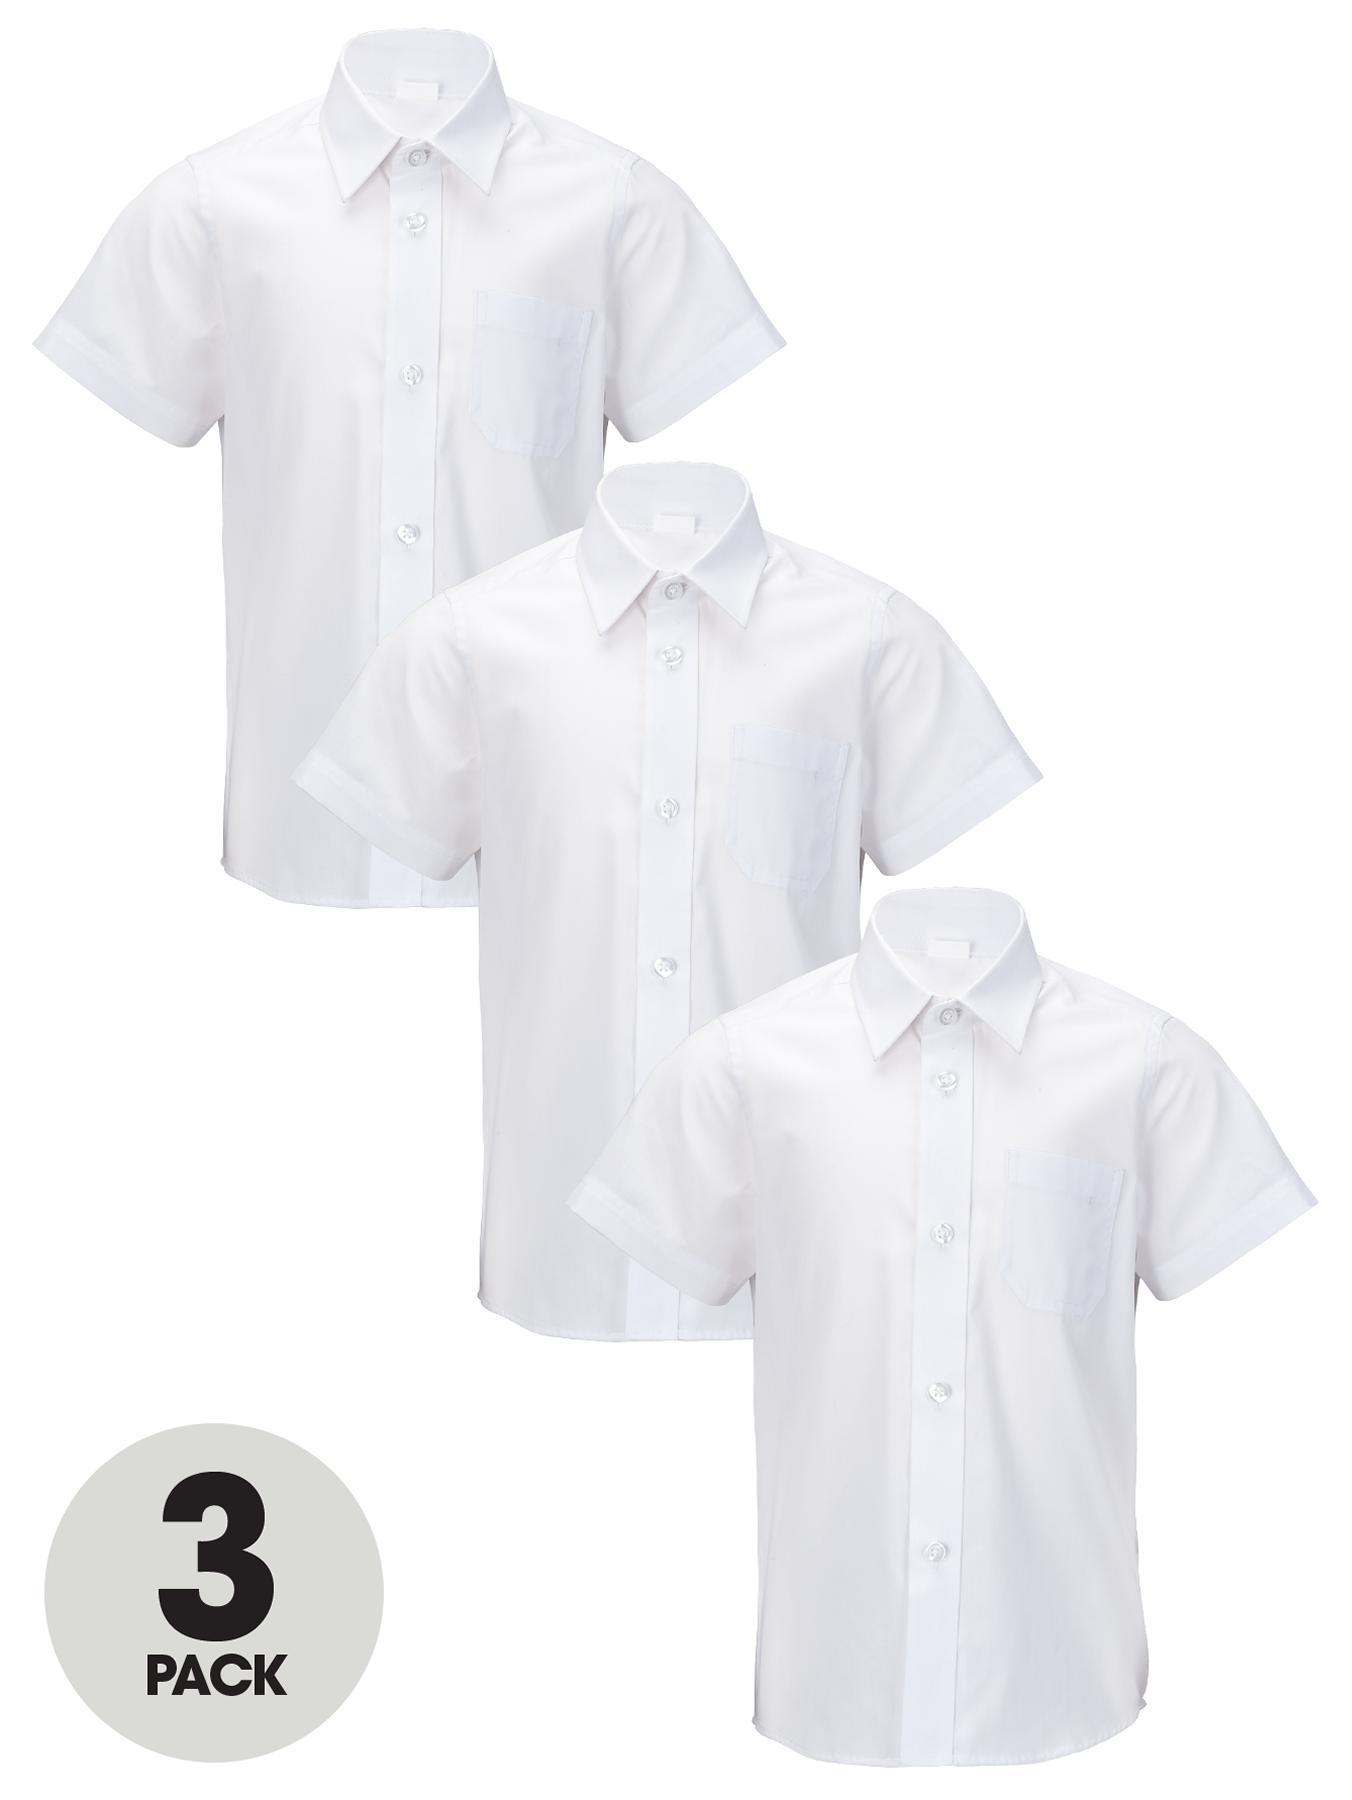 Boys Short Sleeve School Shirts (3 Pack), White,Blue